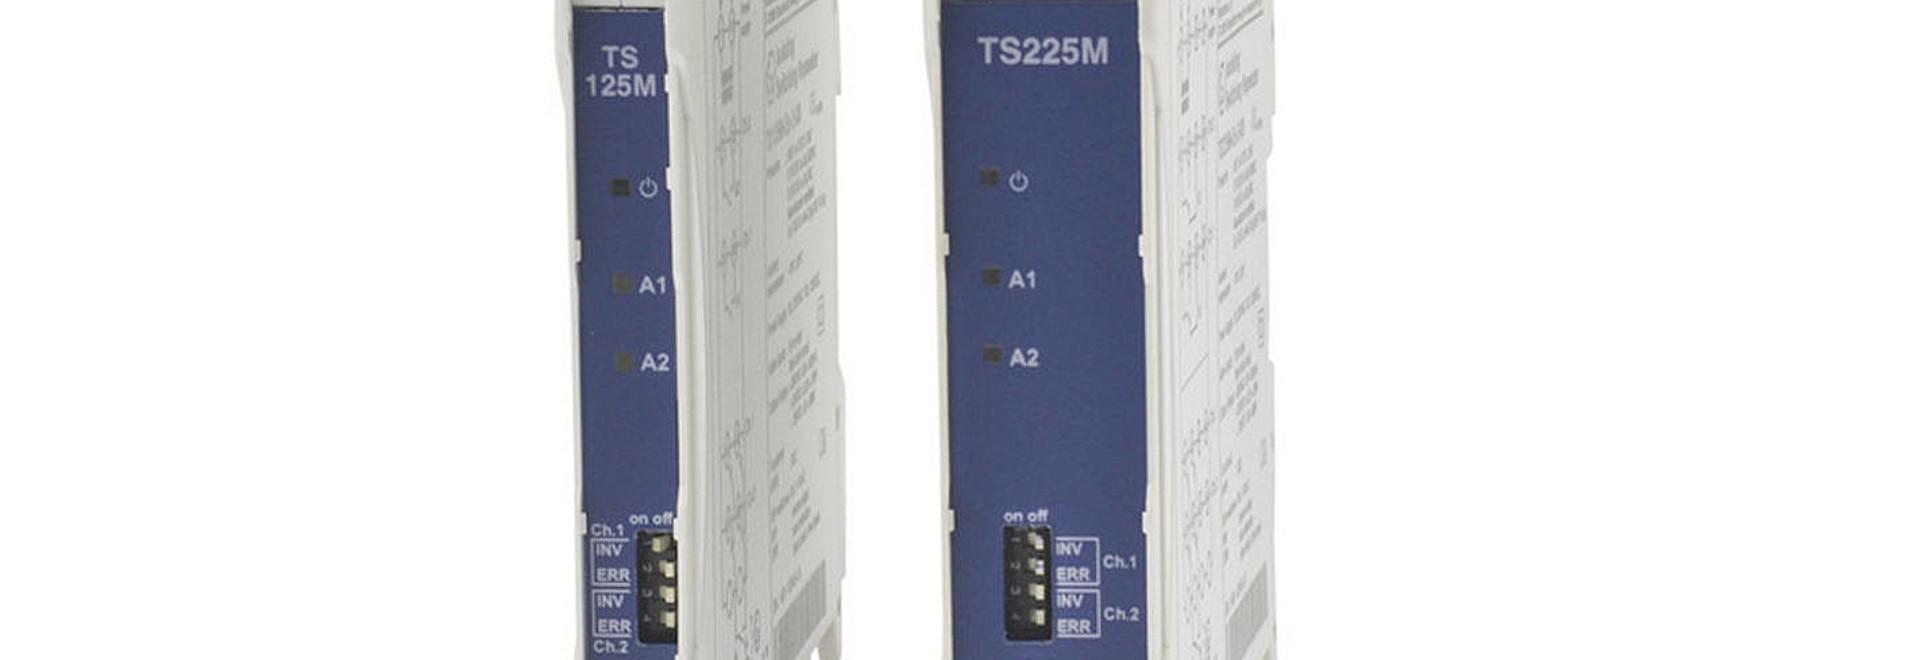 Isolating Converters -  TS125 / 225